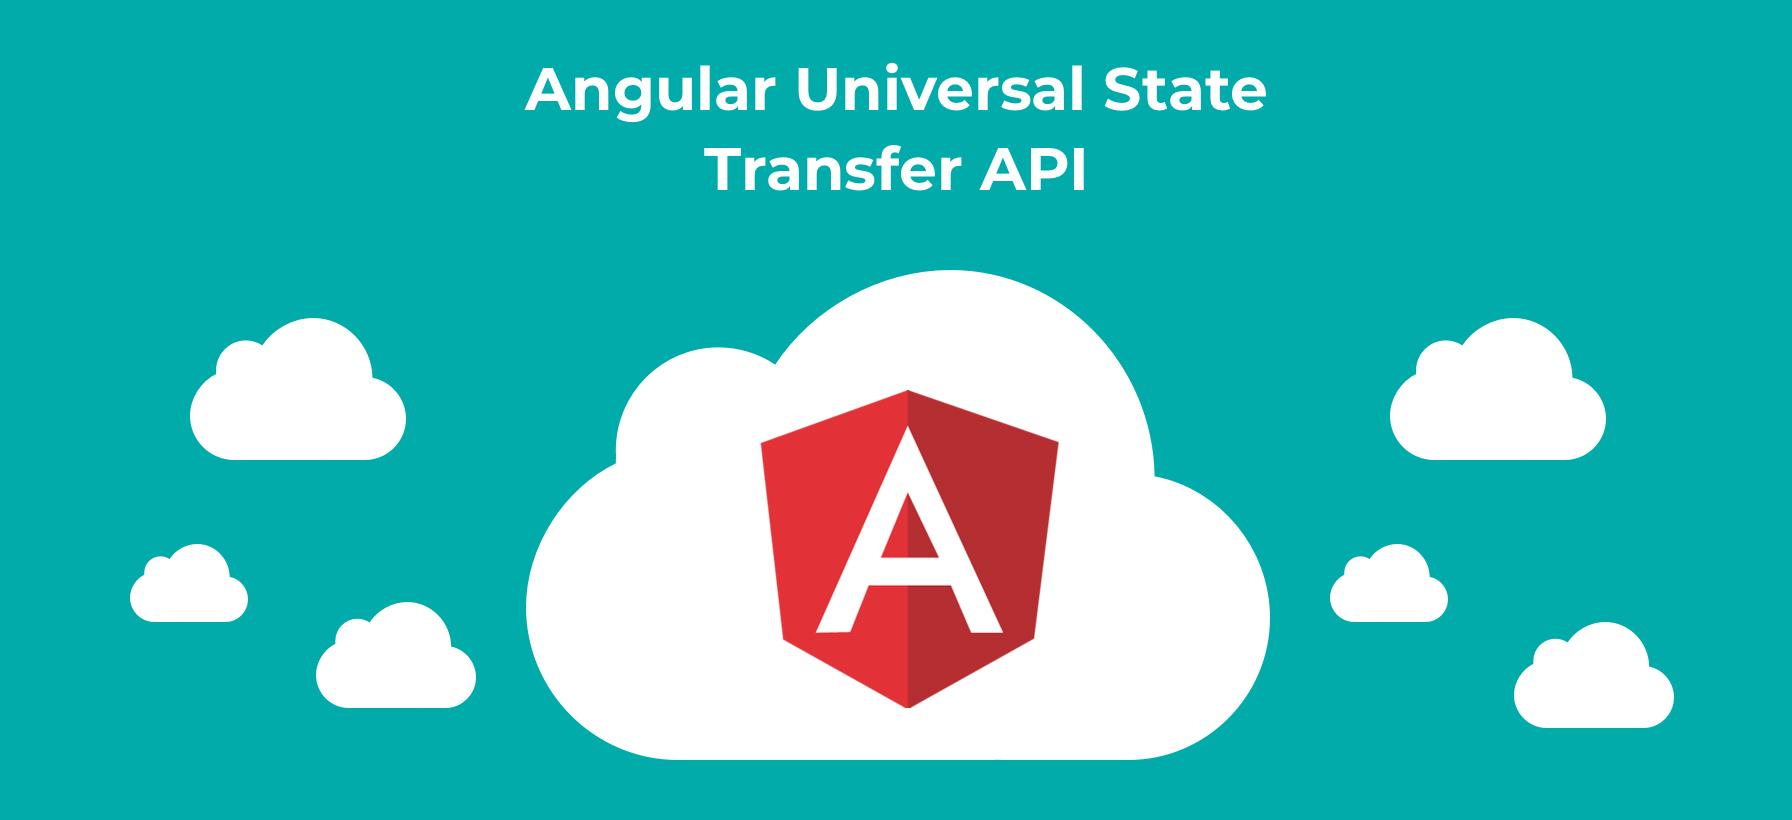 angular-universal-state-transfer-api-1